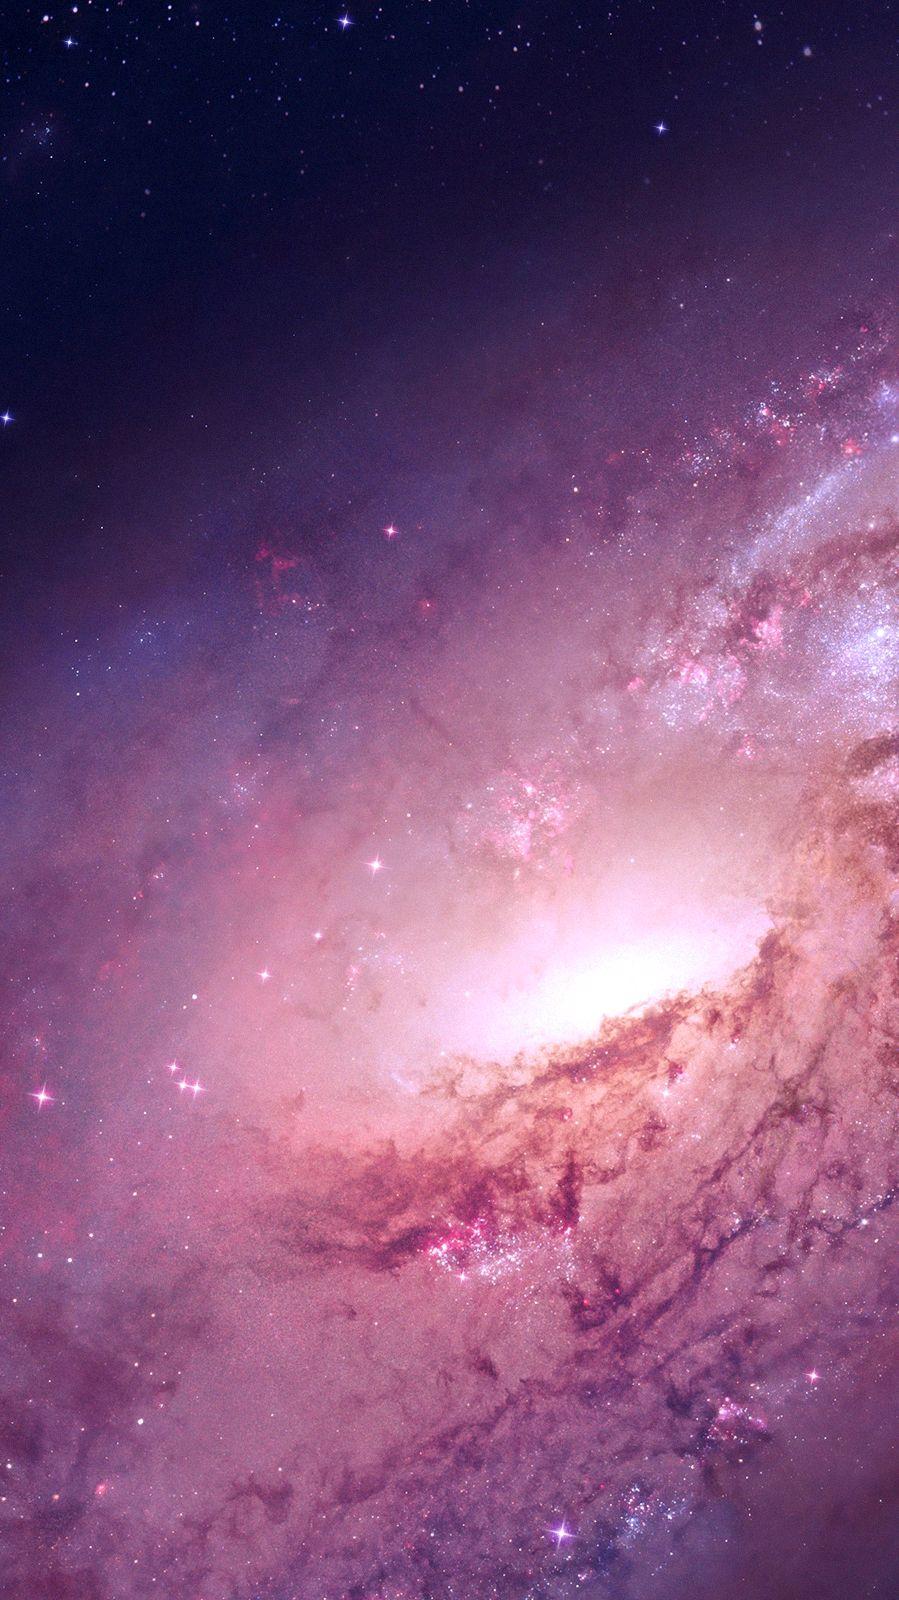 Milky Way Galaxy Nebula iPhone Wallpaper iphoneswallpapers com